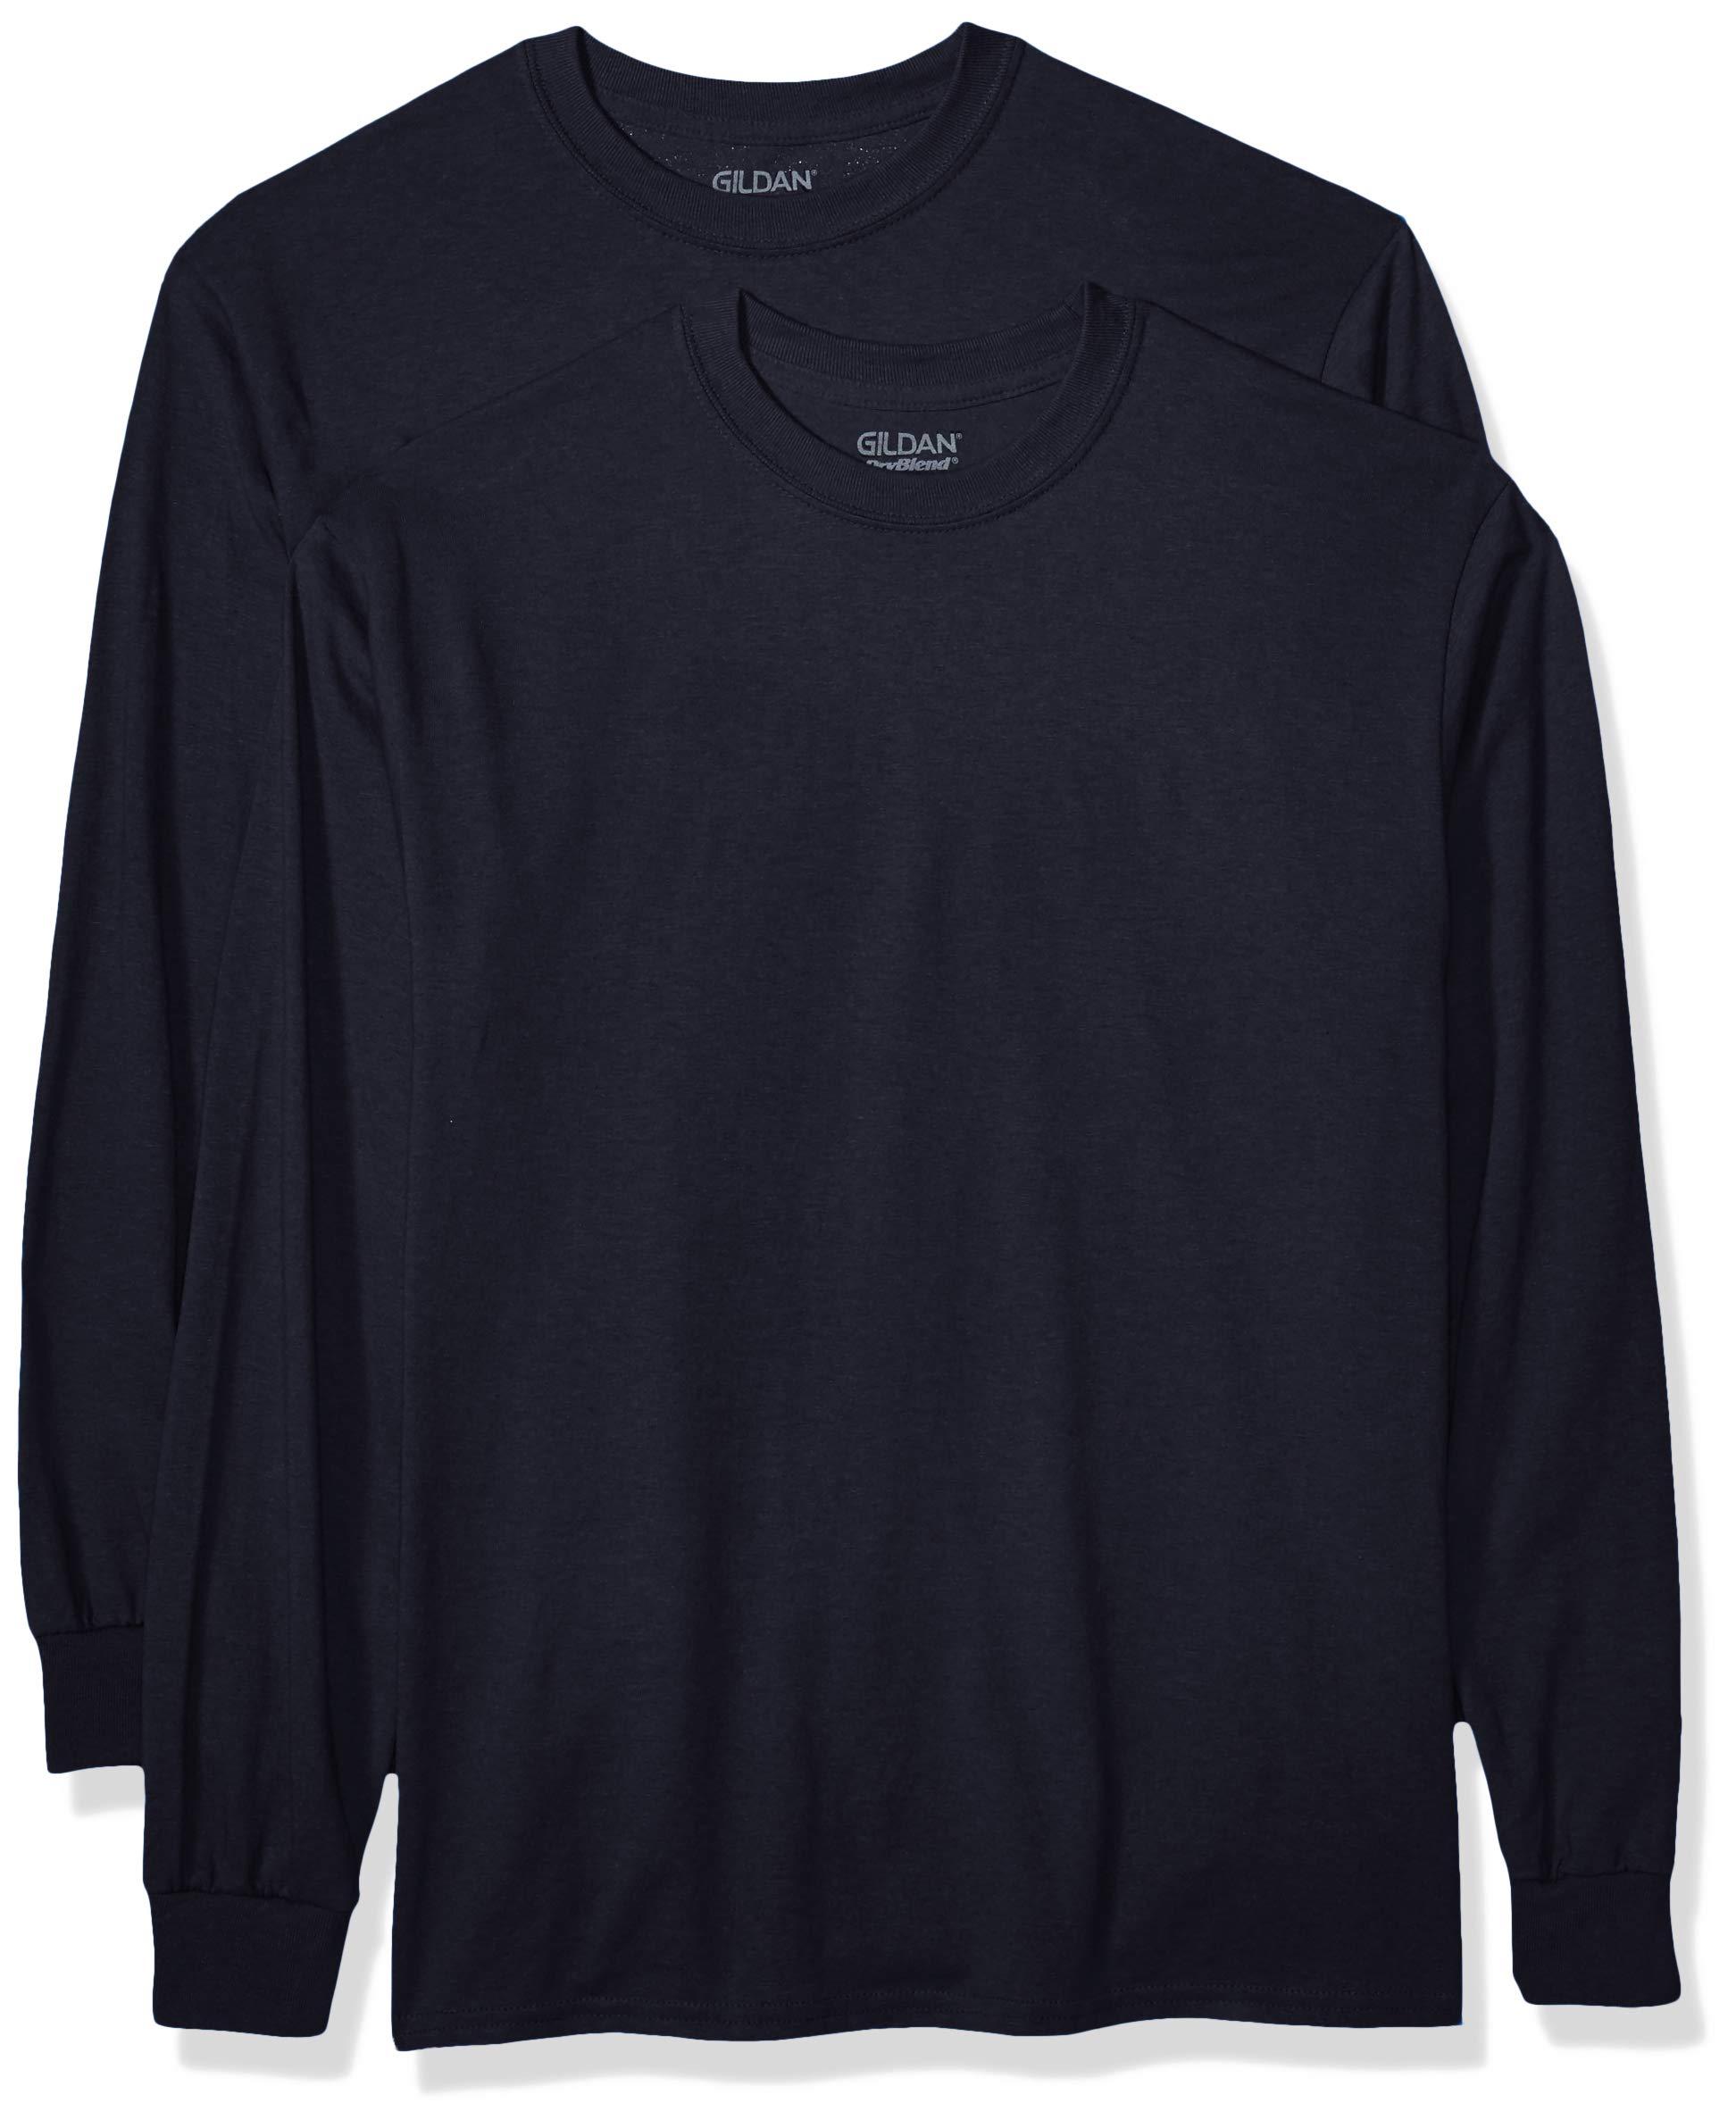 Gildan DryBlend Sleeve T Shirt 2X Large